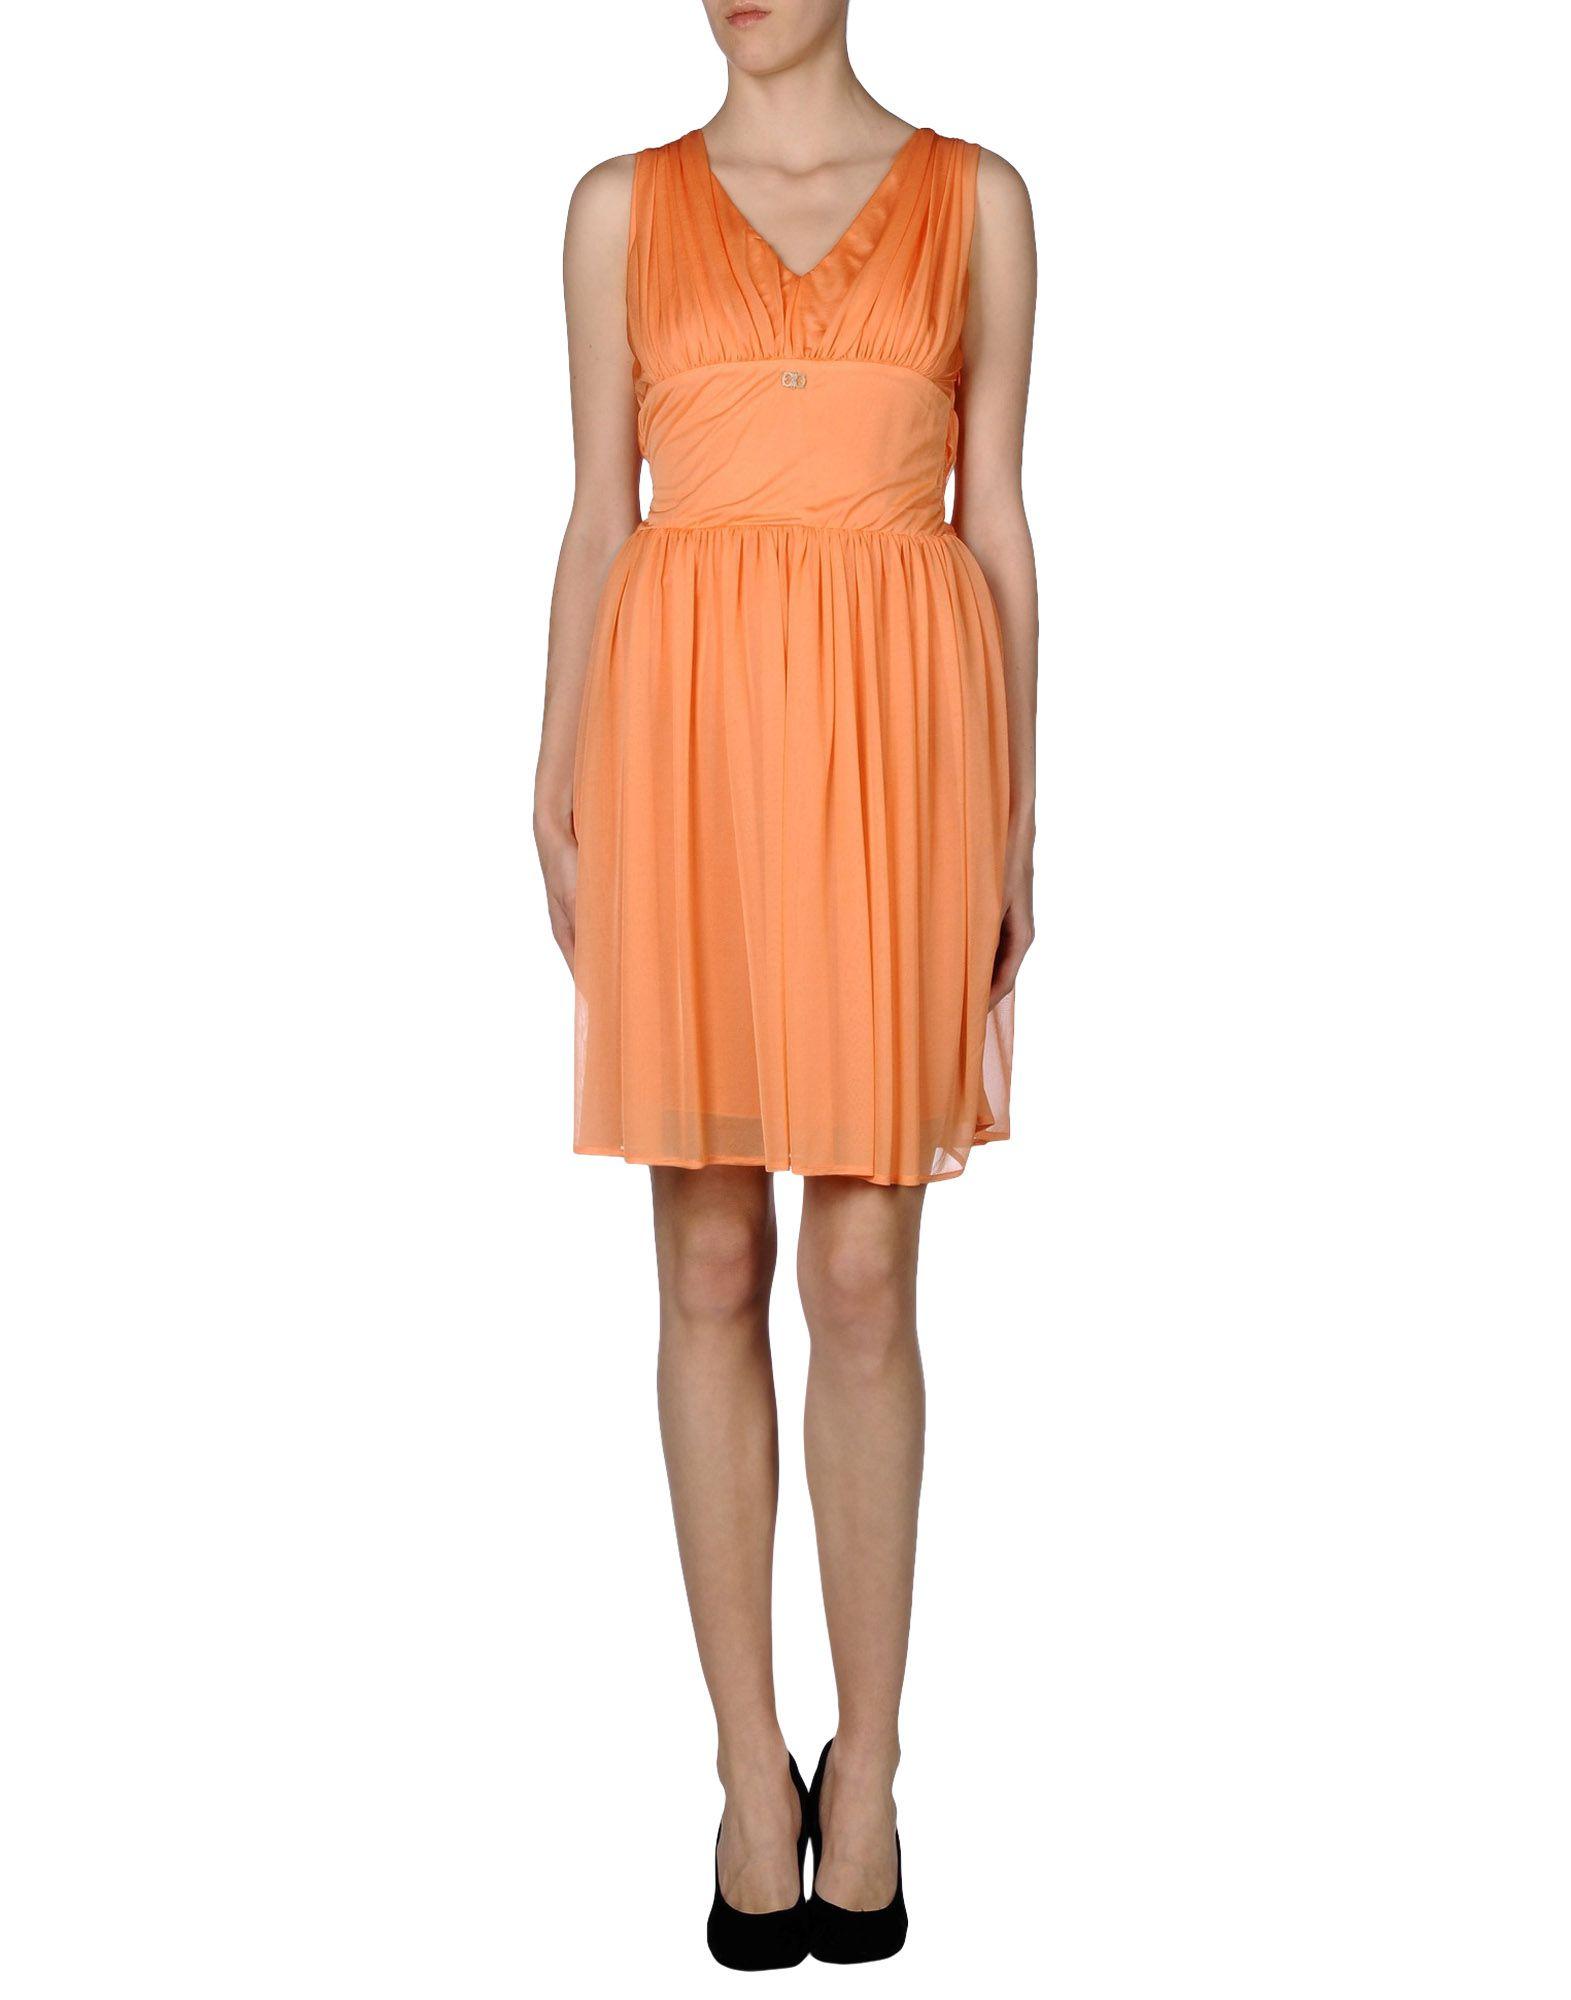 Lyst - Class roberto cavalli Short Dress in Orange